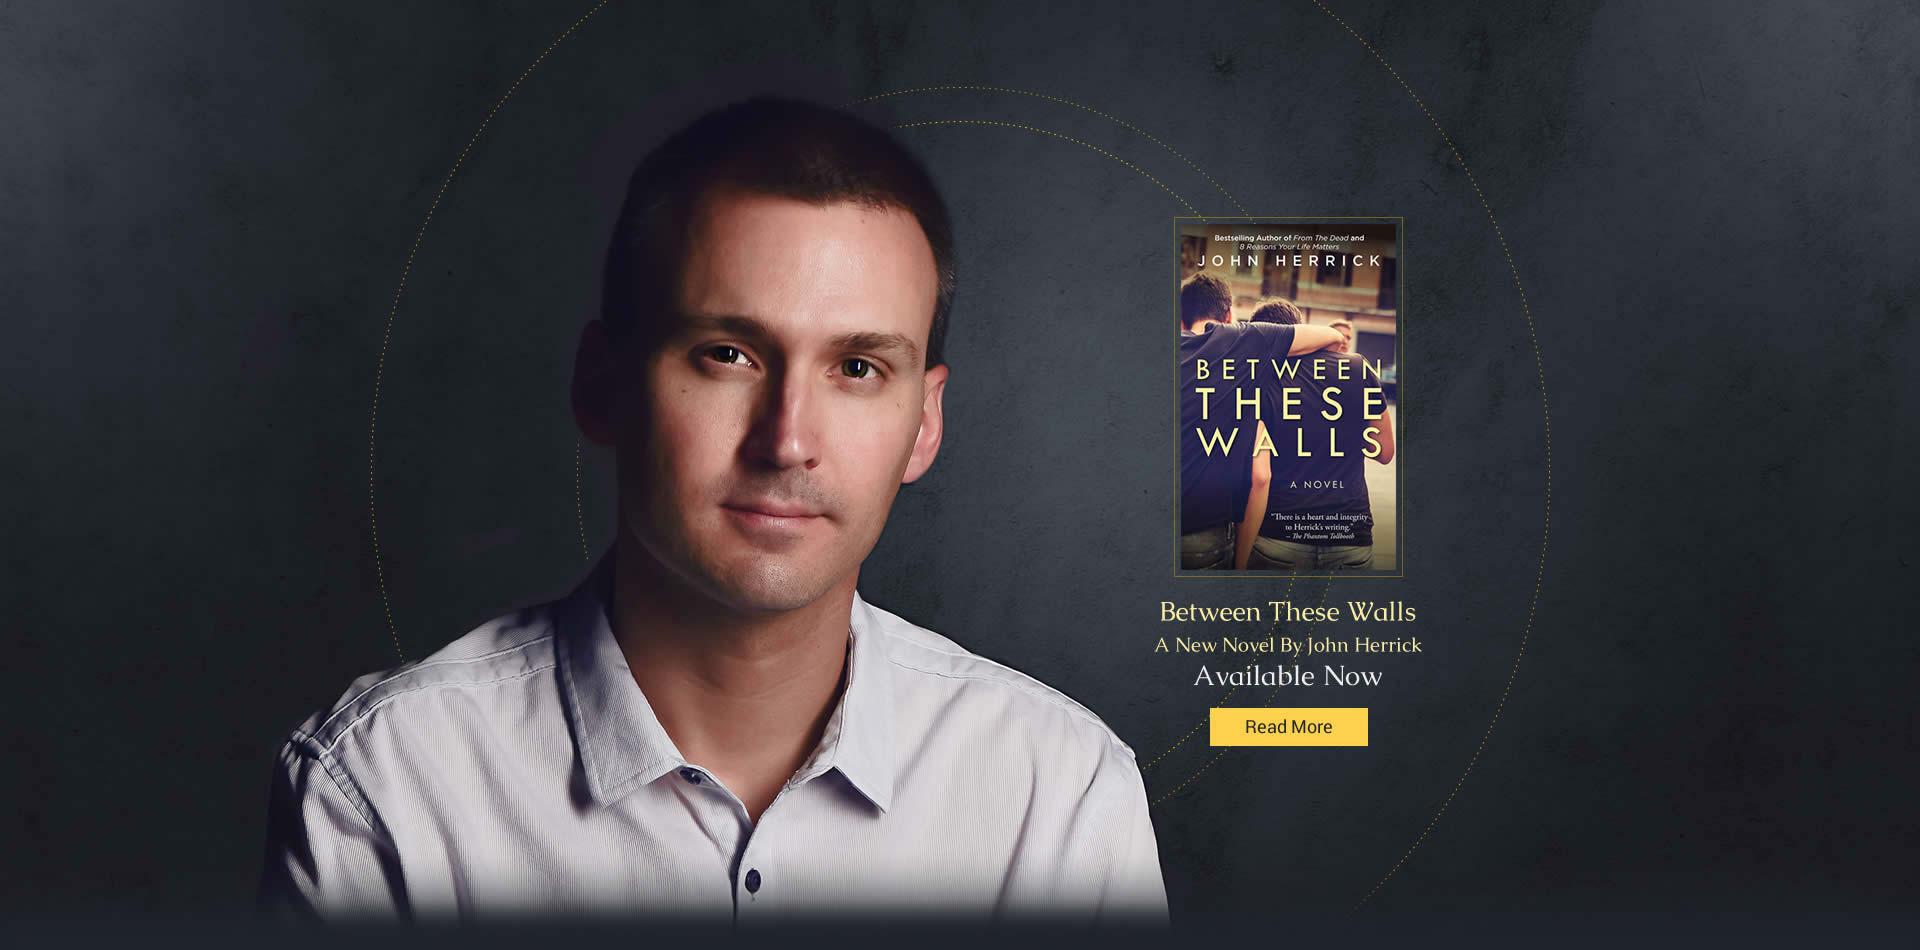 John Herrick Bestselling Author